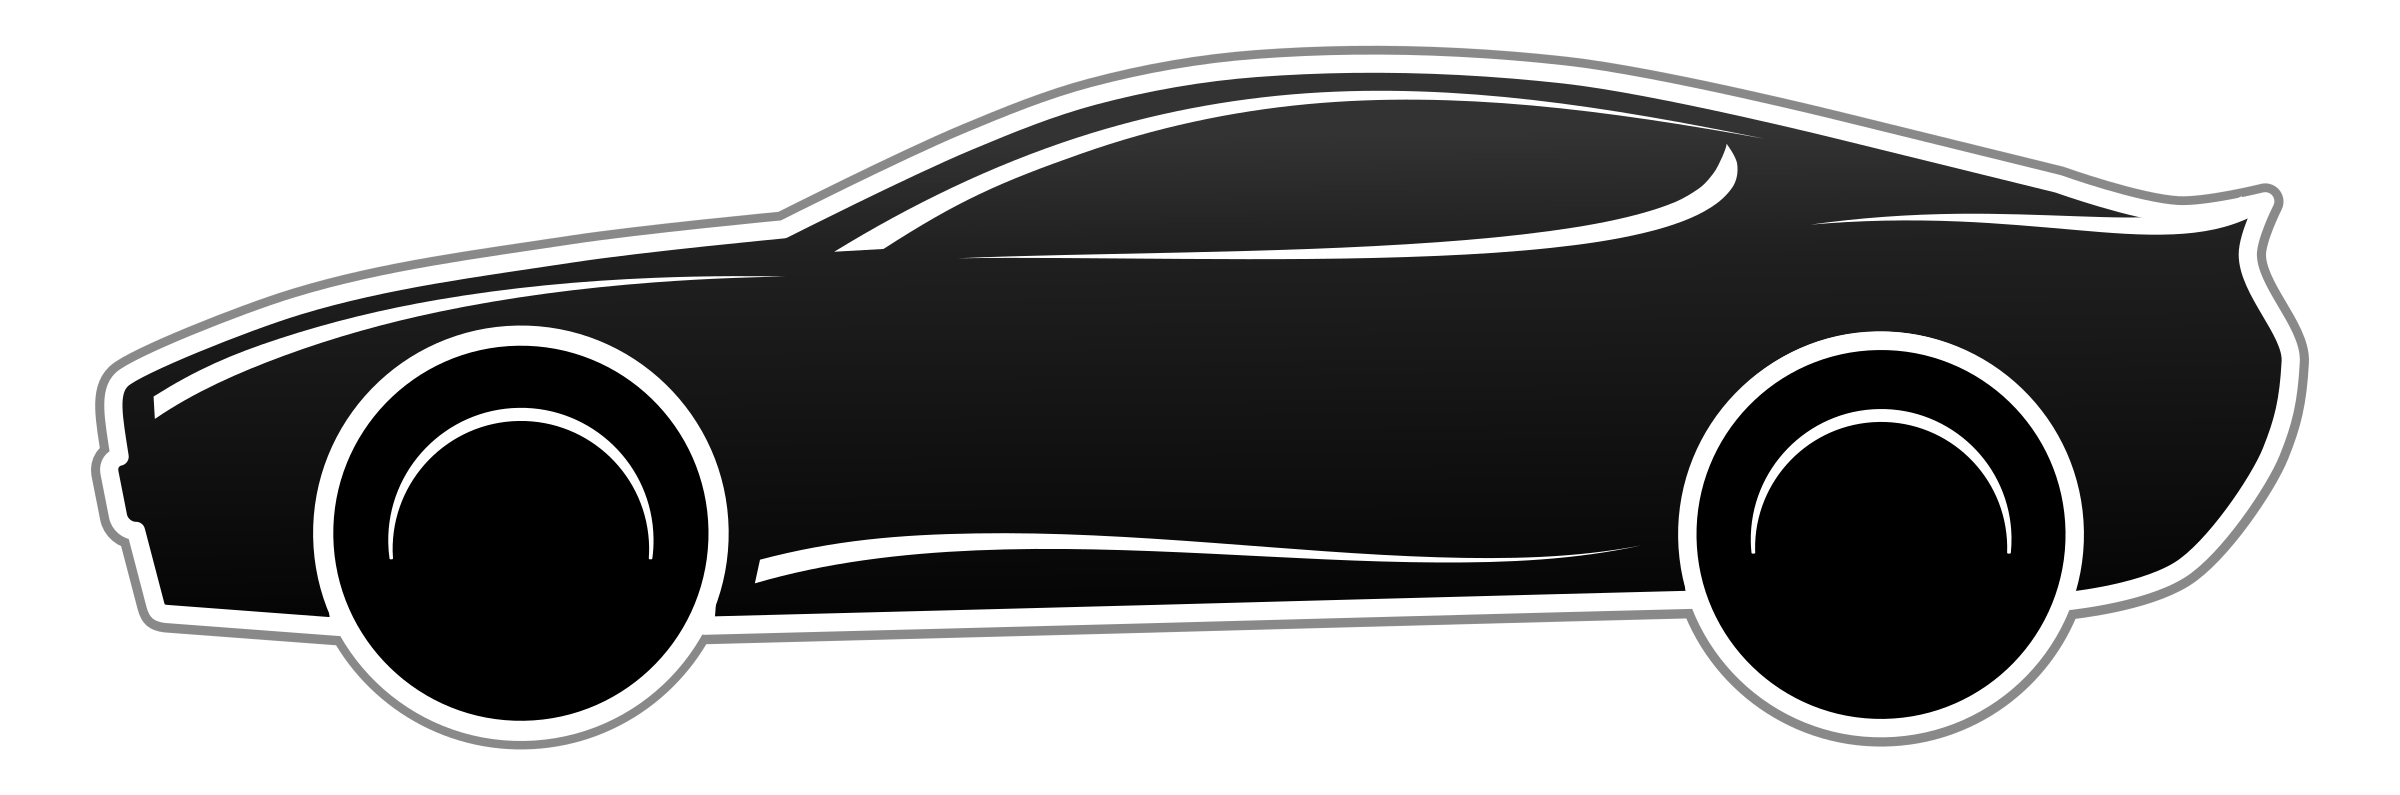 Clipart design car, Clipart design car Transparent FREE for.